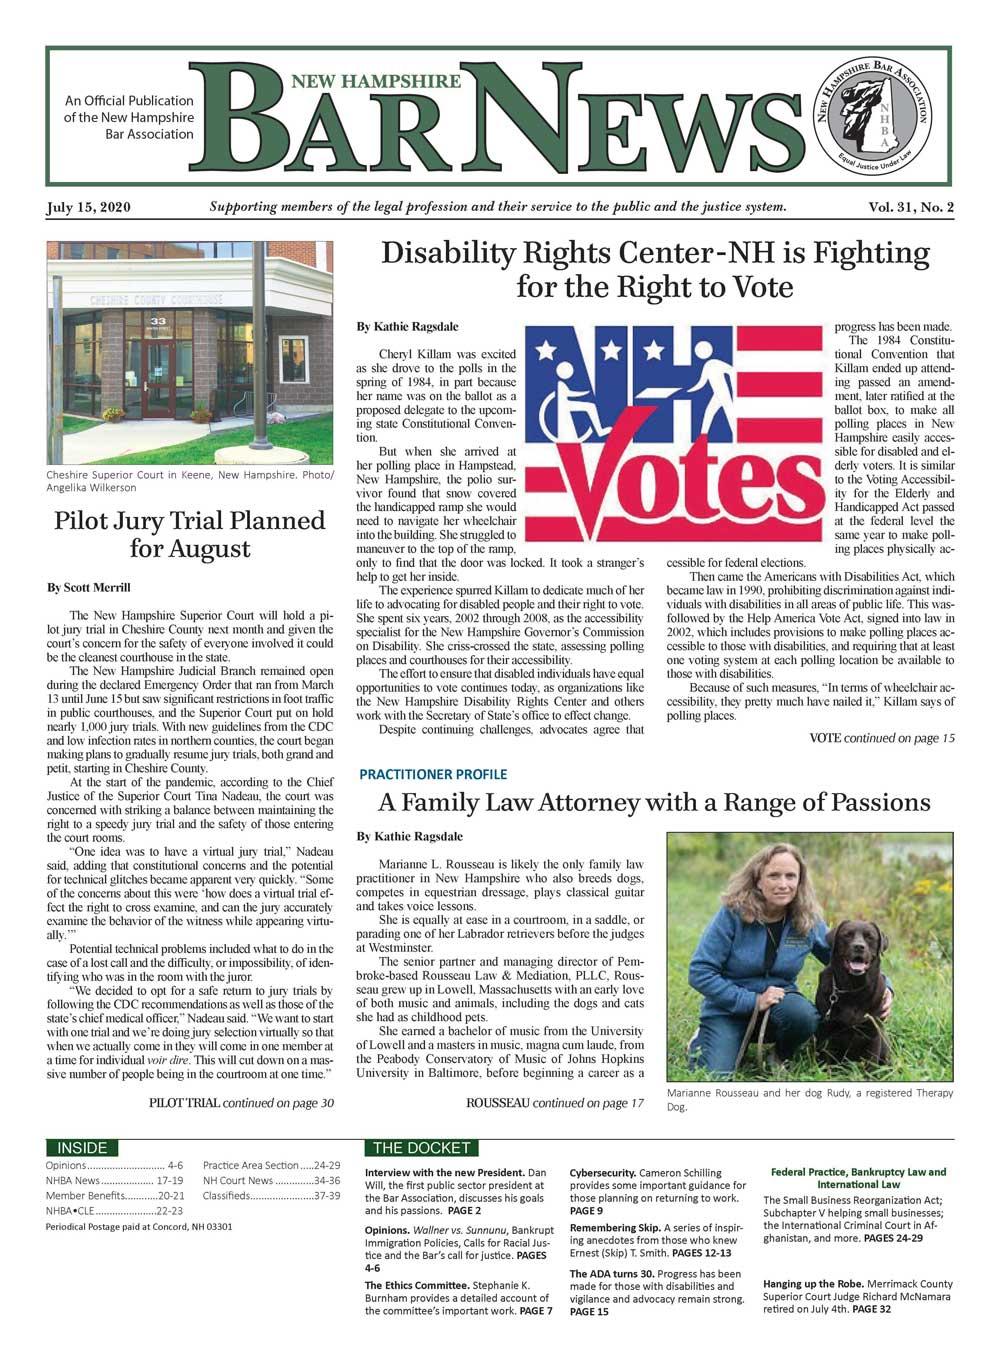 Bar News July 15, 2020